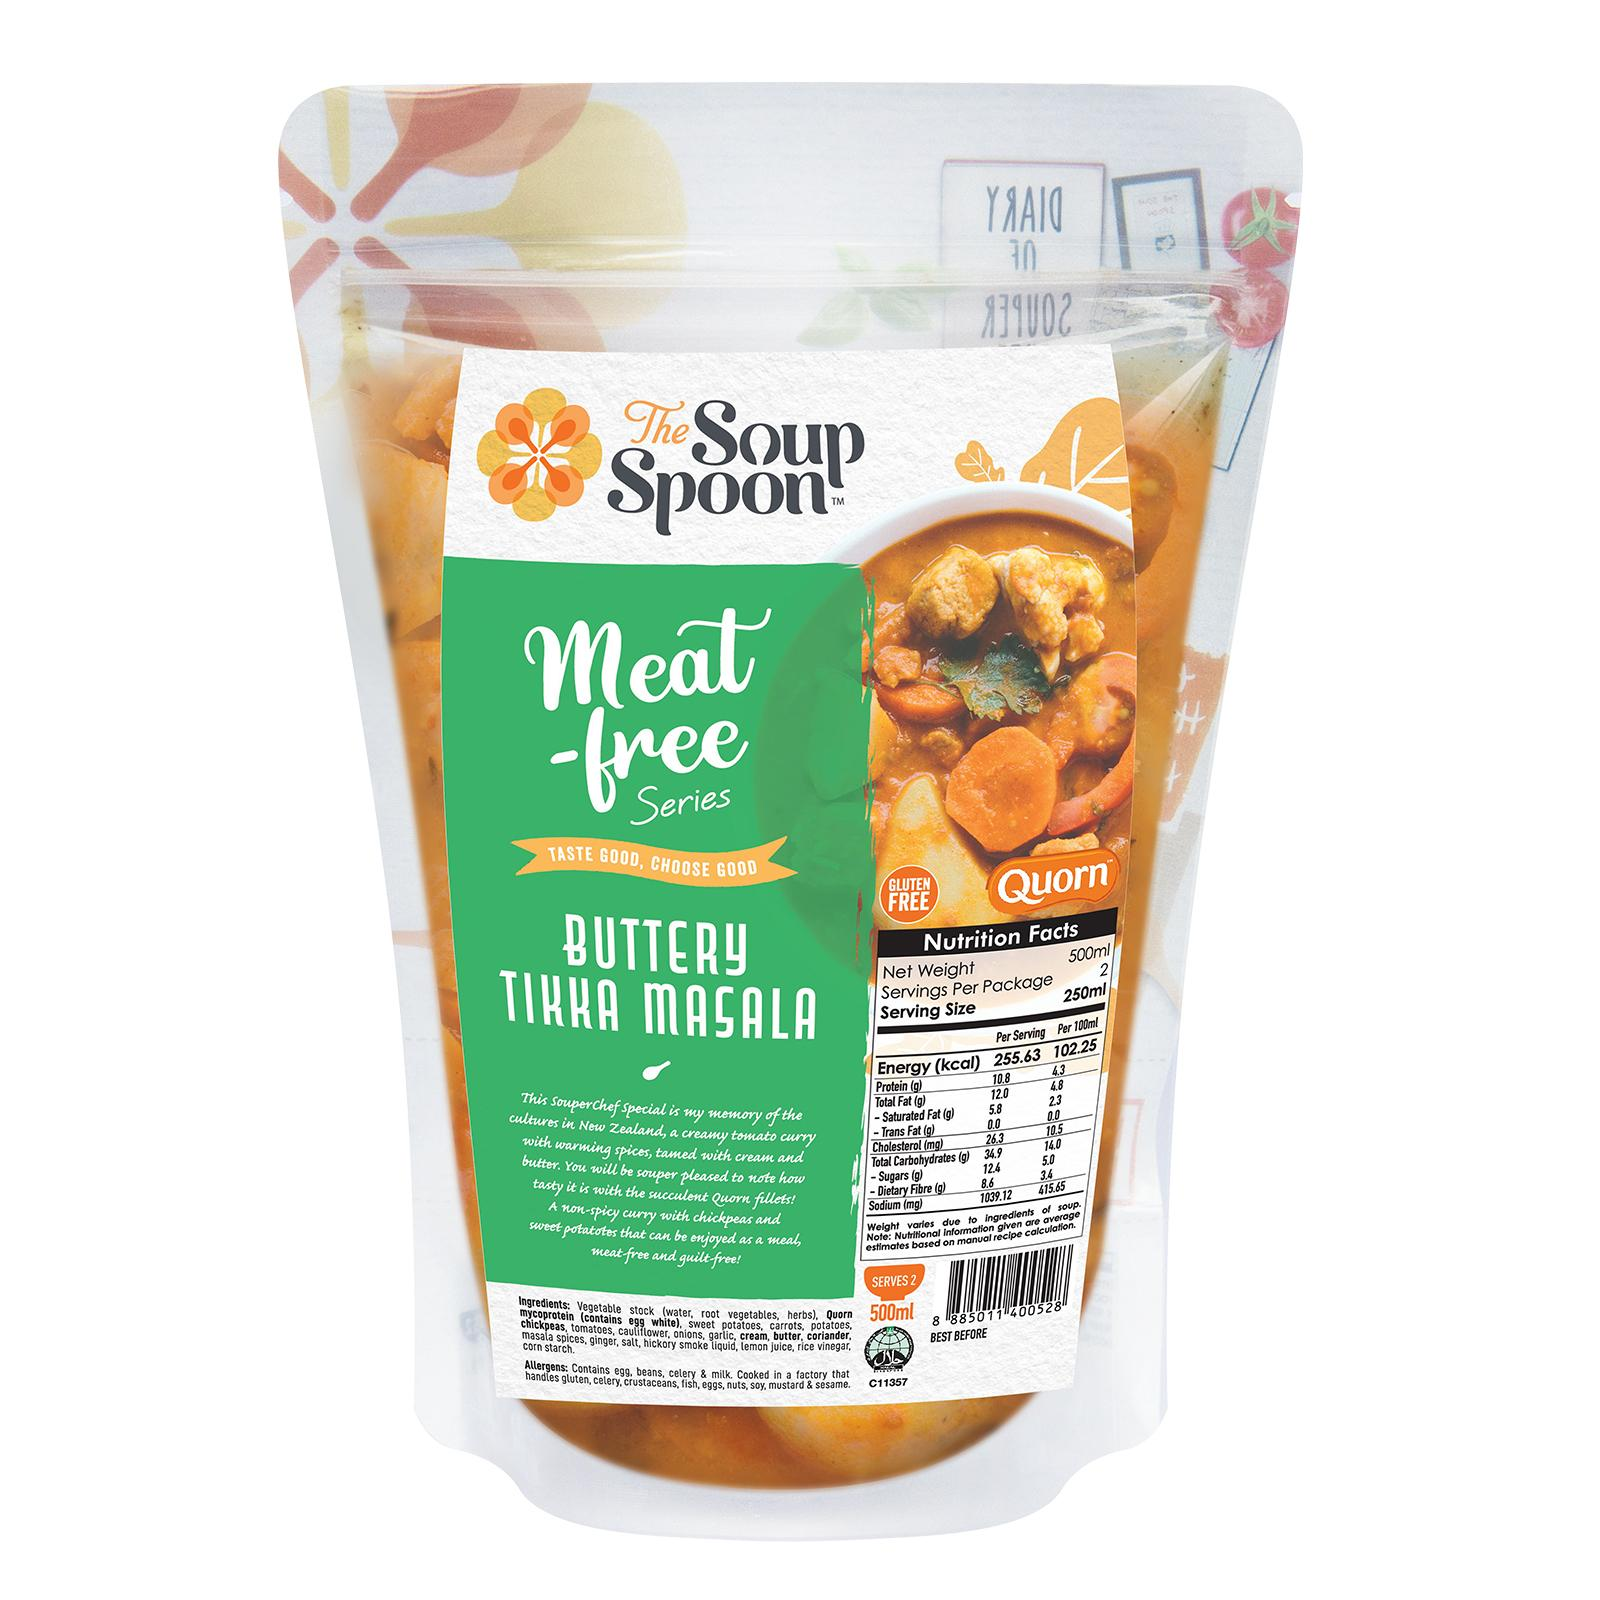 The Soup Spoon Buttery Tikka Masala Soup